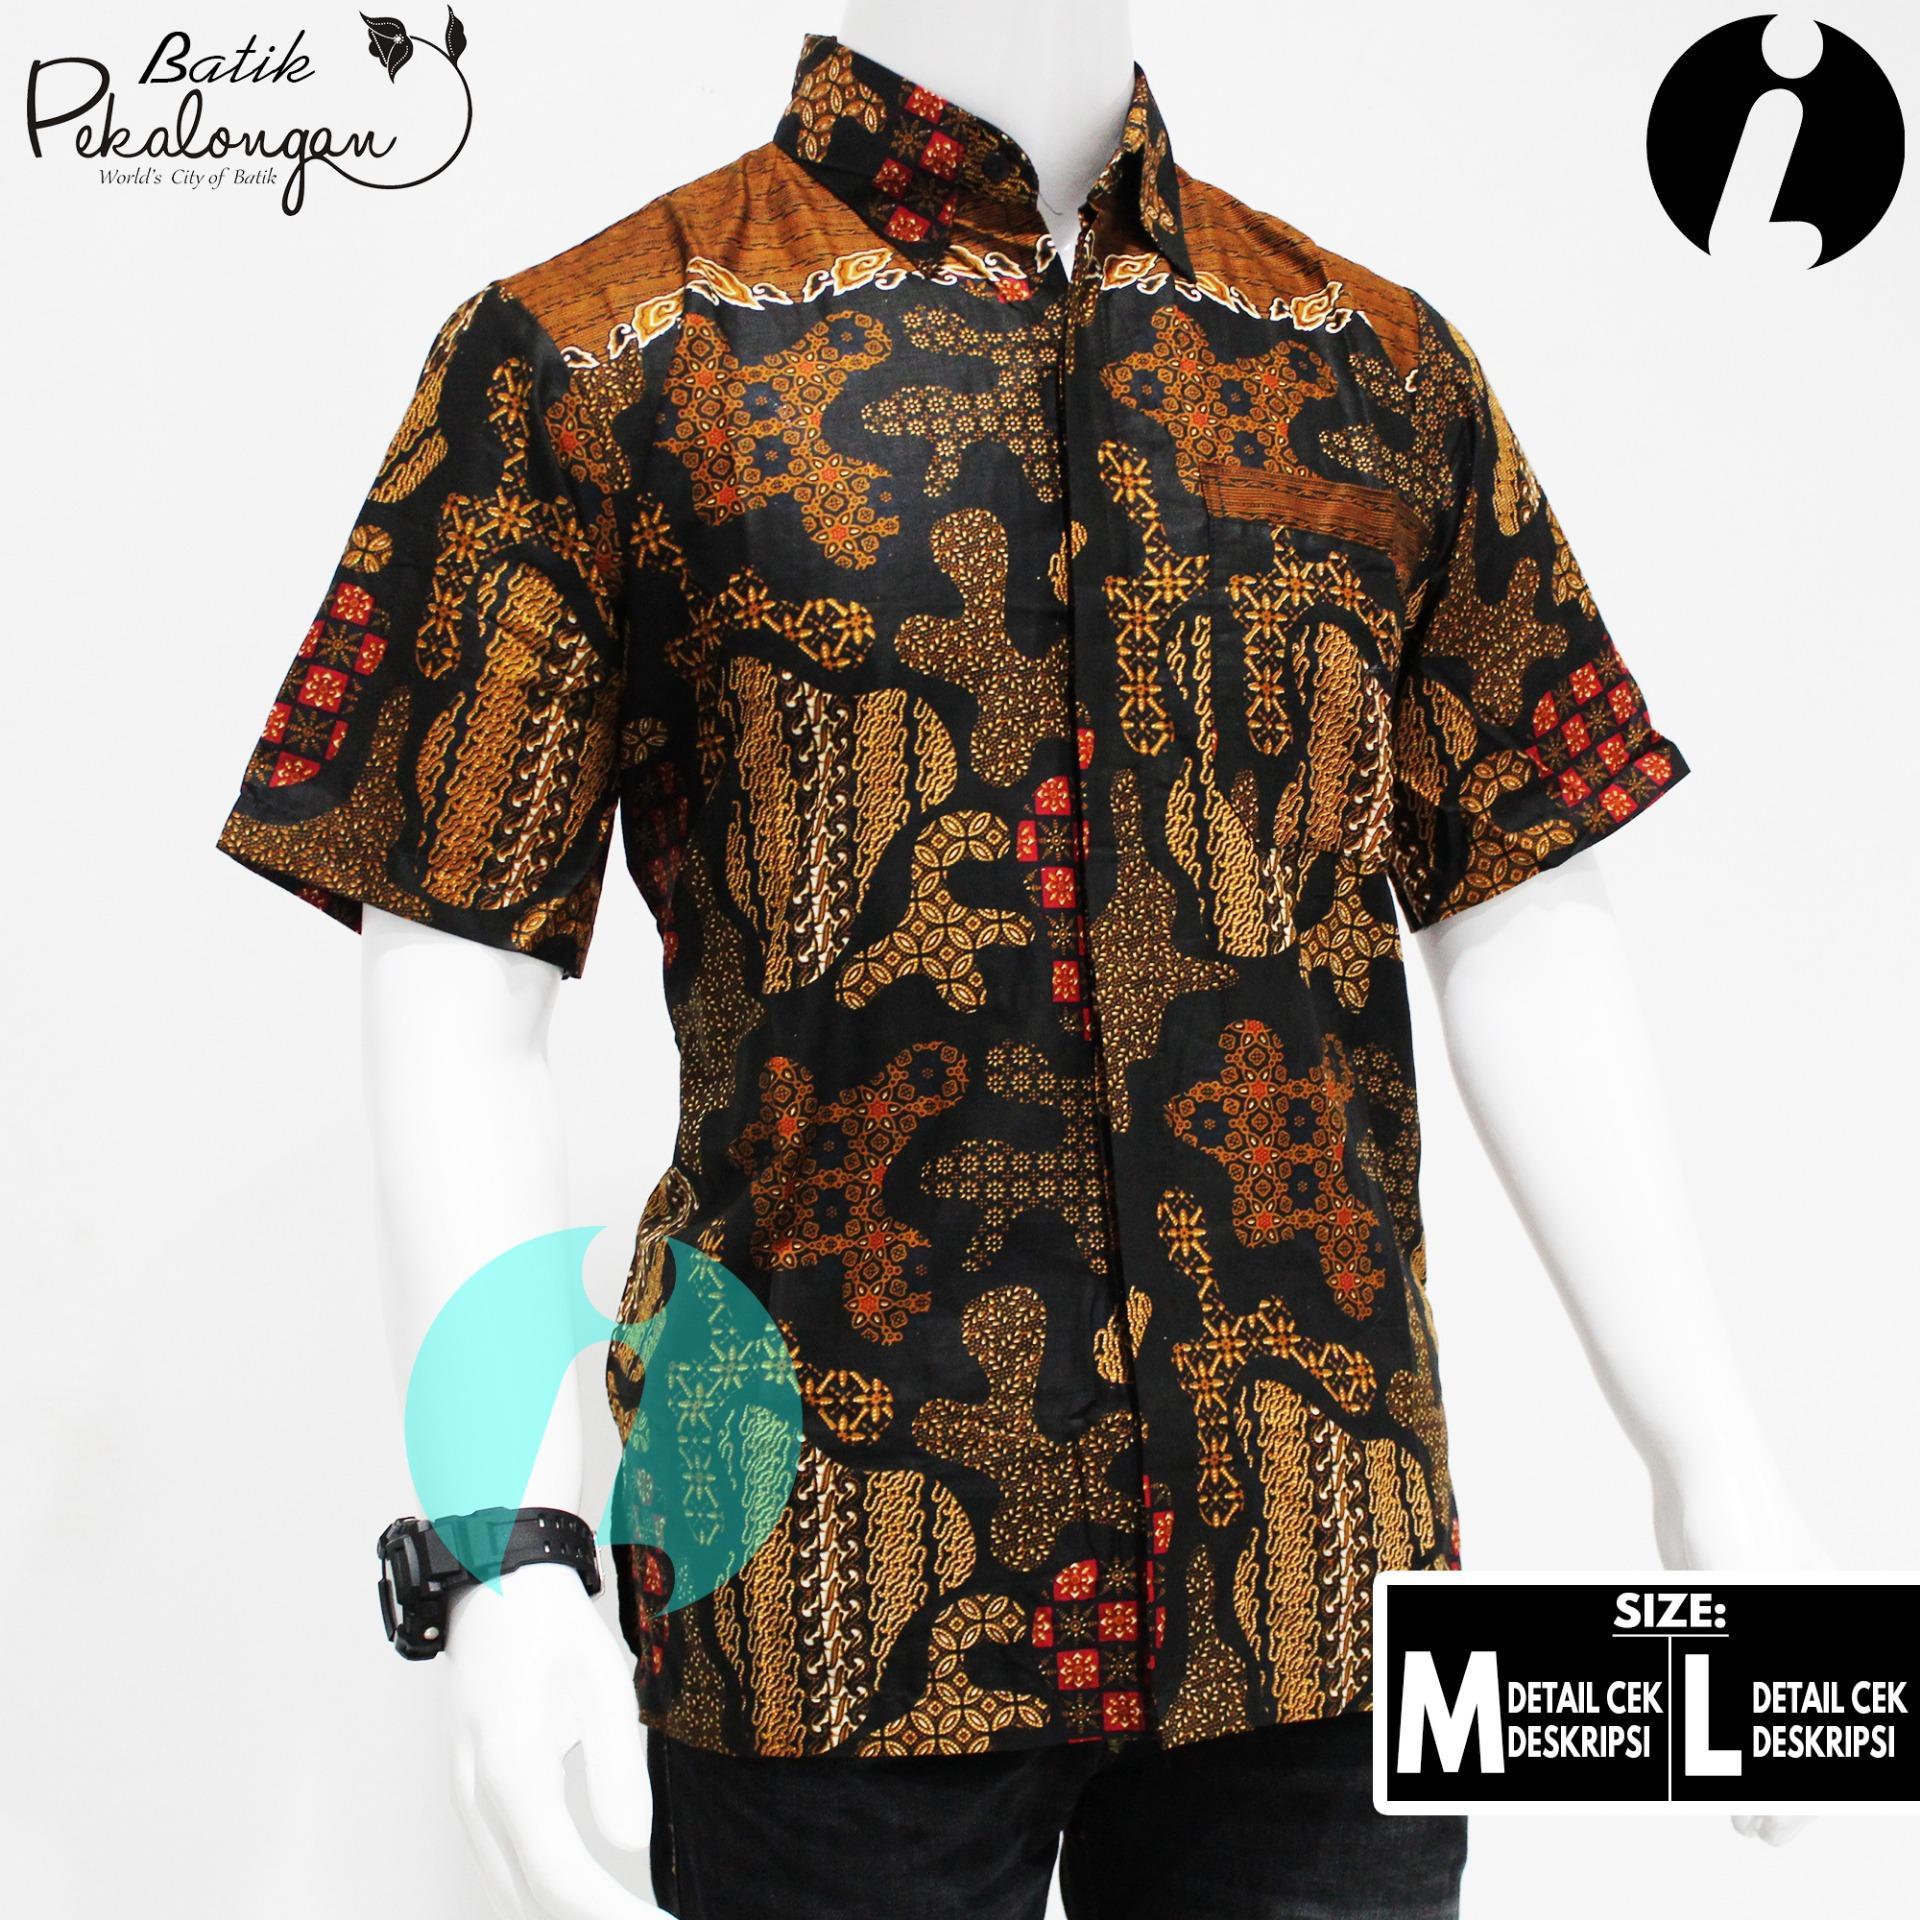 Baju Batik Pria Batik Pekalongan Model 014 - Christmas Design Ideas 2018 430e505ad7